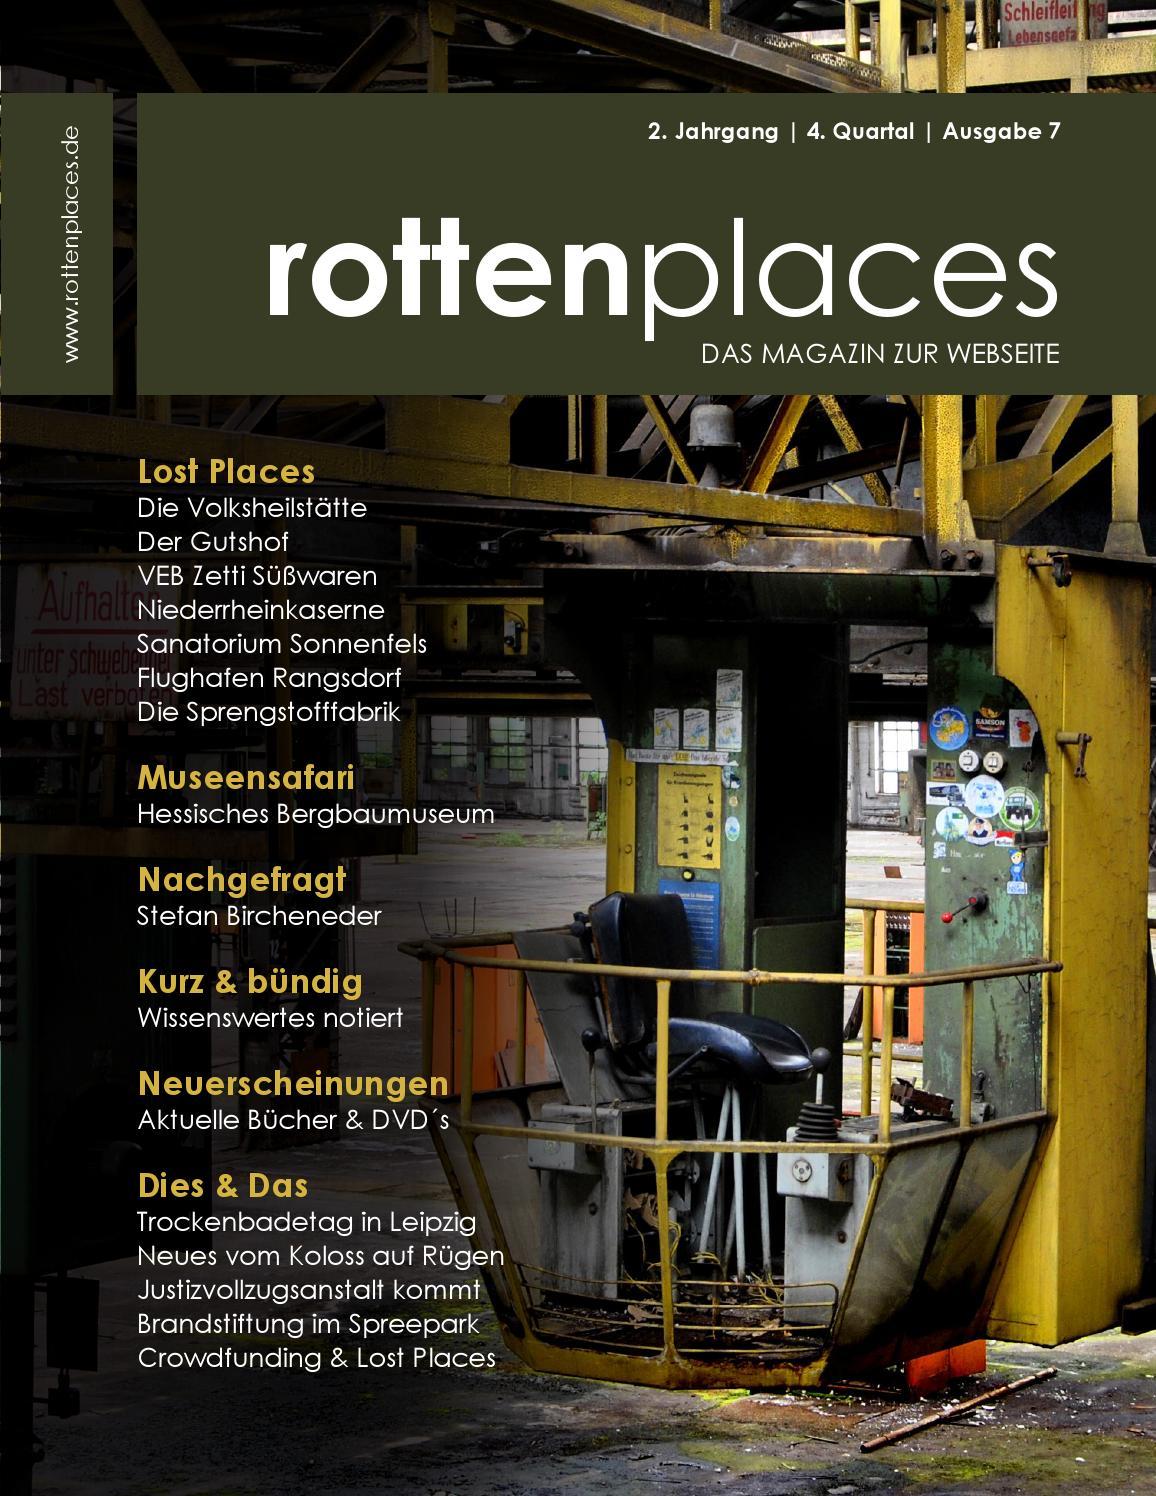 rottenplaces Magazin 4/2014 by rottenplaces.de - issuu